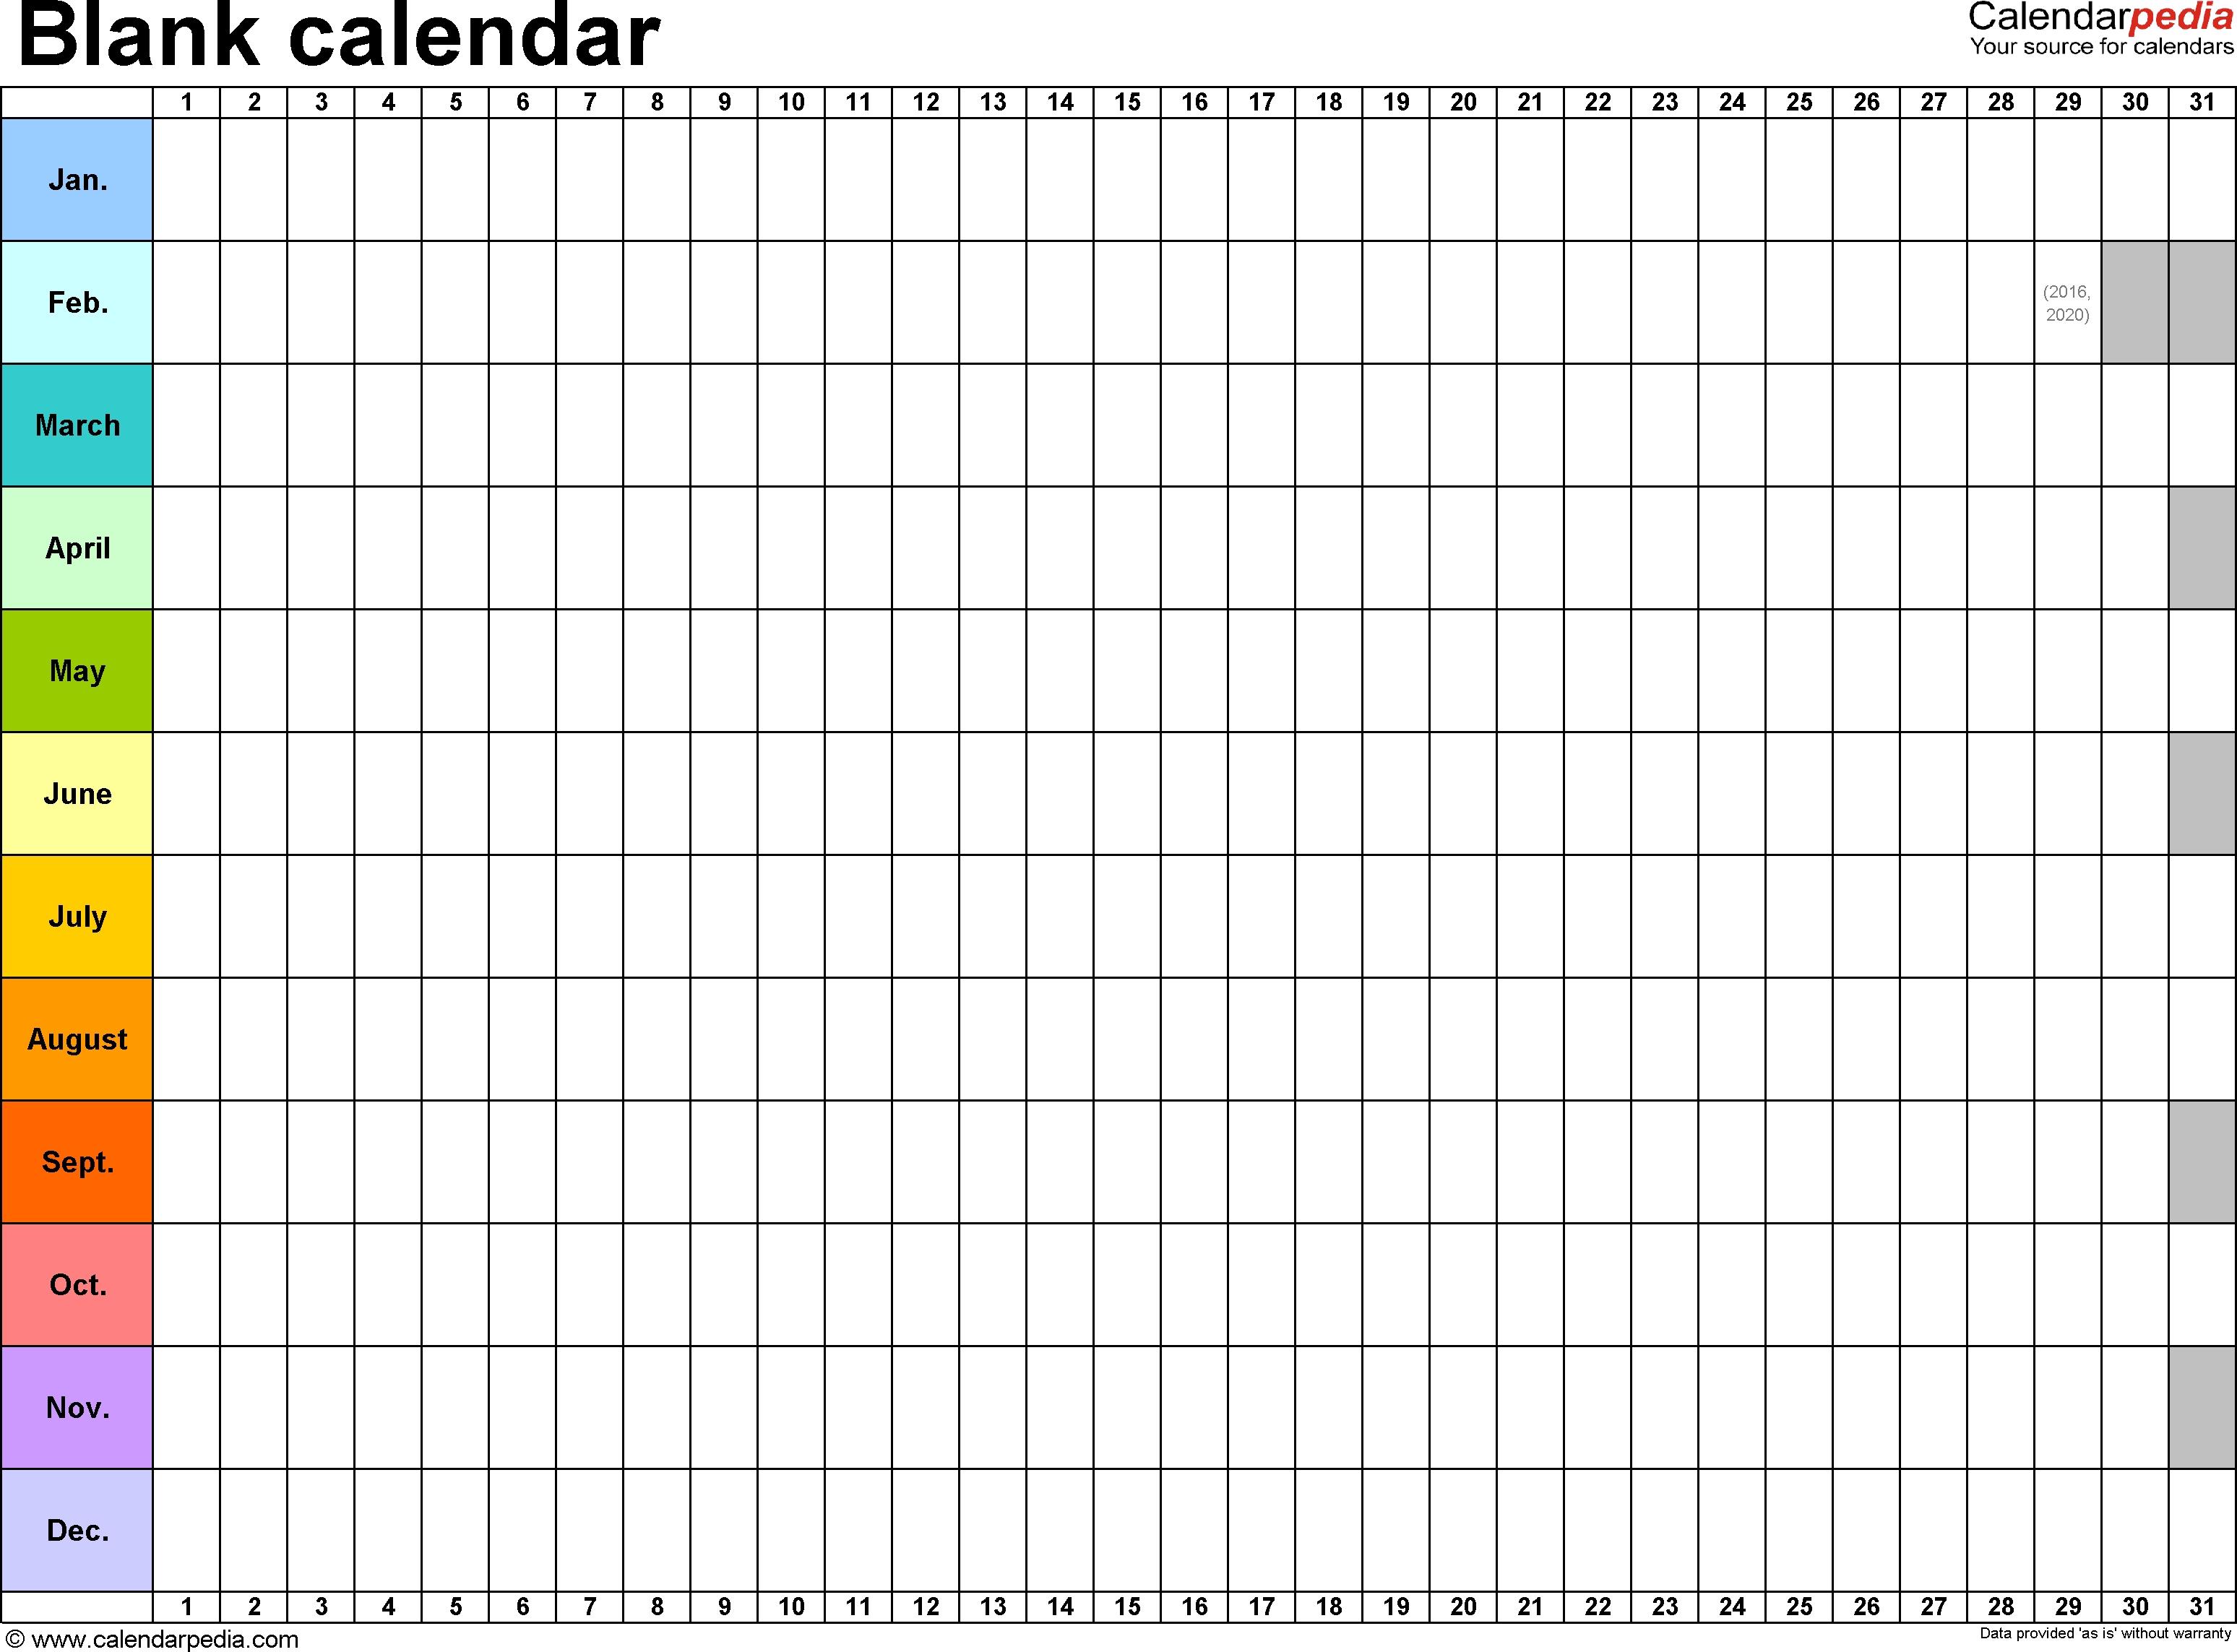 Blank Calendar - 9 Free Printable Microsoft Excel Templates Year Calendar Template For Excel